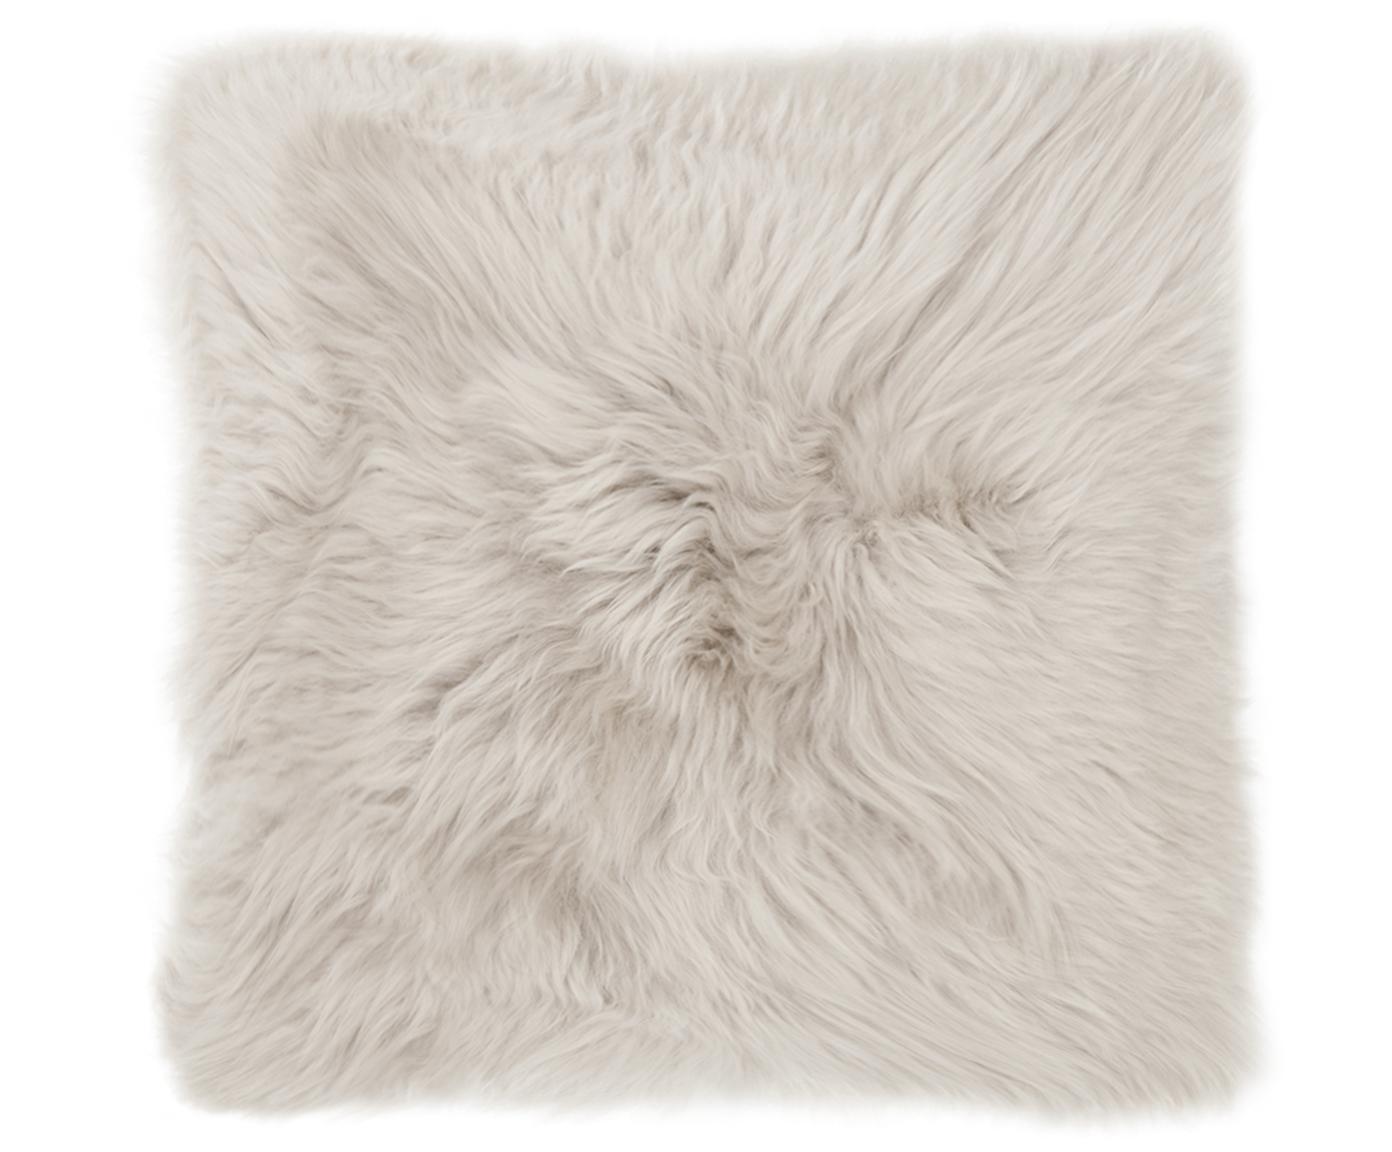 Schaffell-Kissenhülle Oslo, glatt, Vorderseite: 100% Schaffell, Rückseite: Leinen, Vorderseite: BeigeRückseite: Hellgrau, 40 x 40 cm